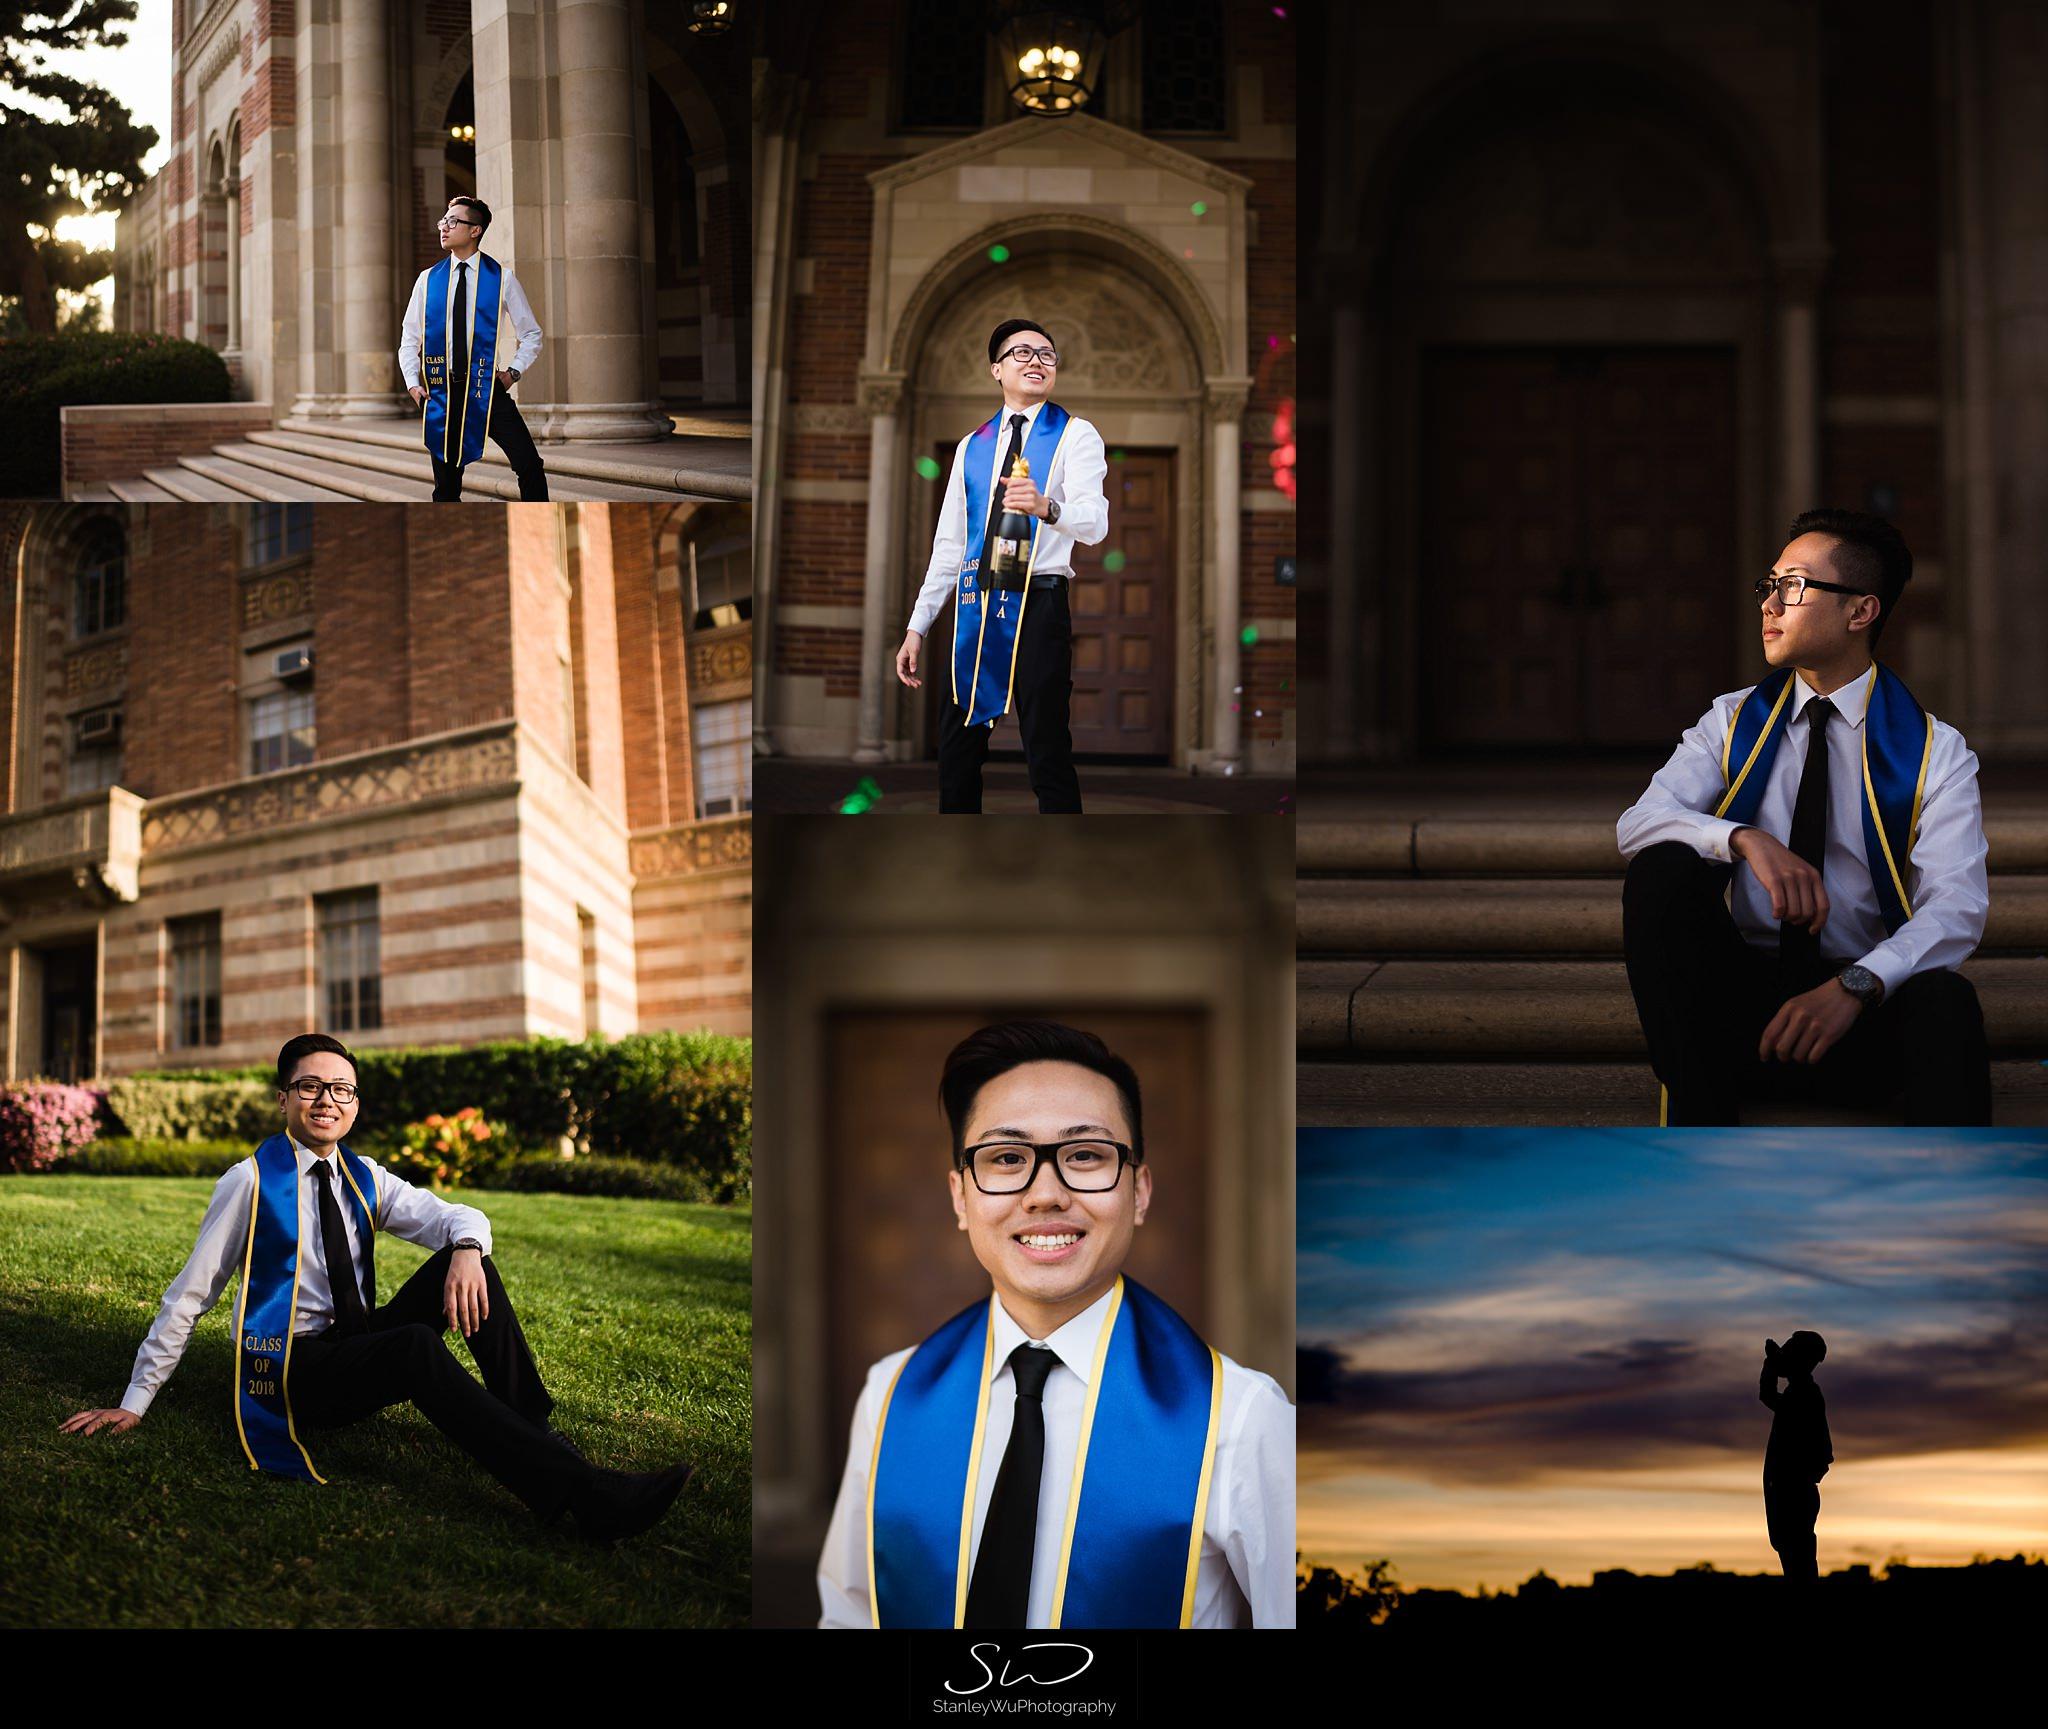 ucla-fashion-graduation-portrait-senior-session_0029.jpg